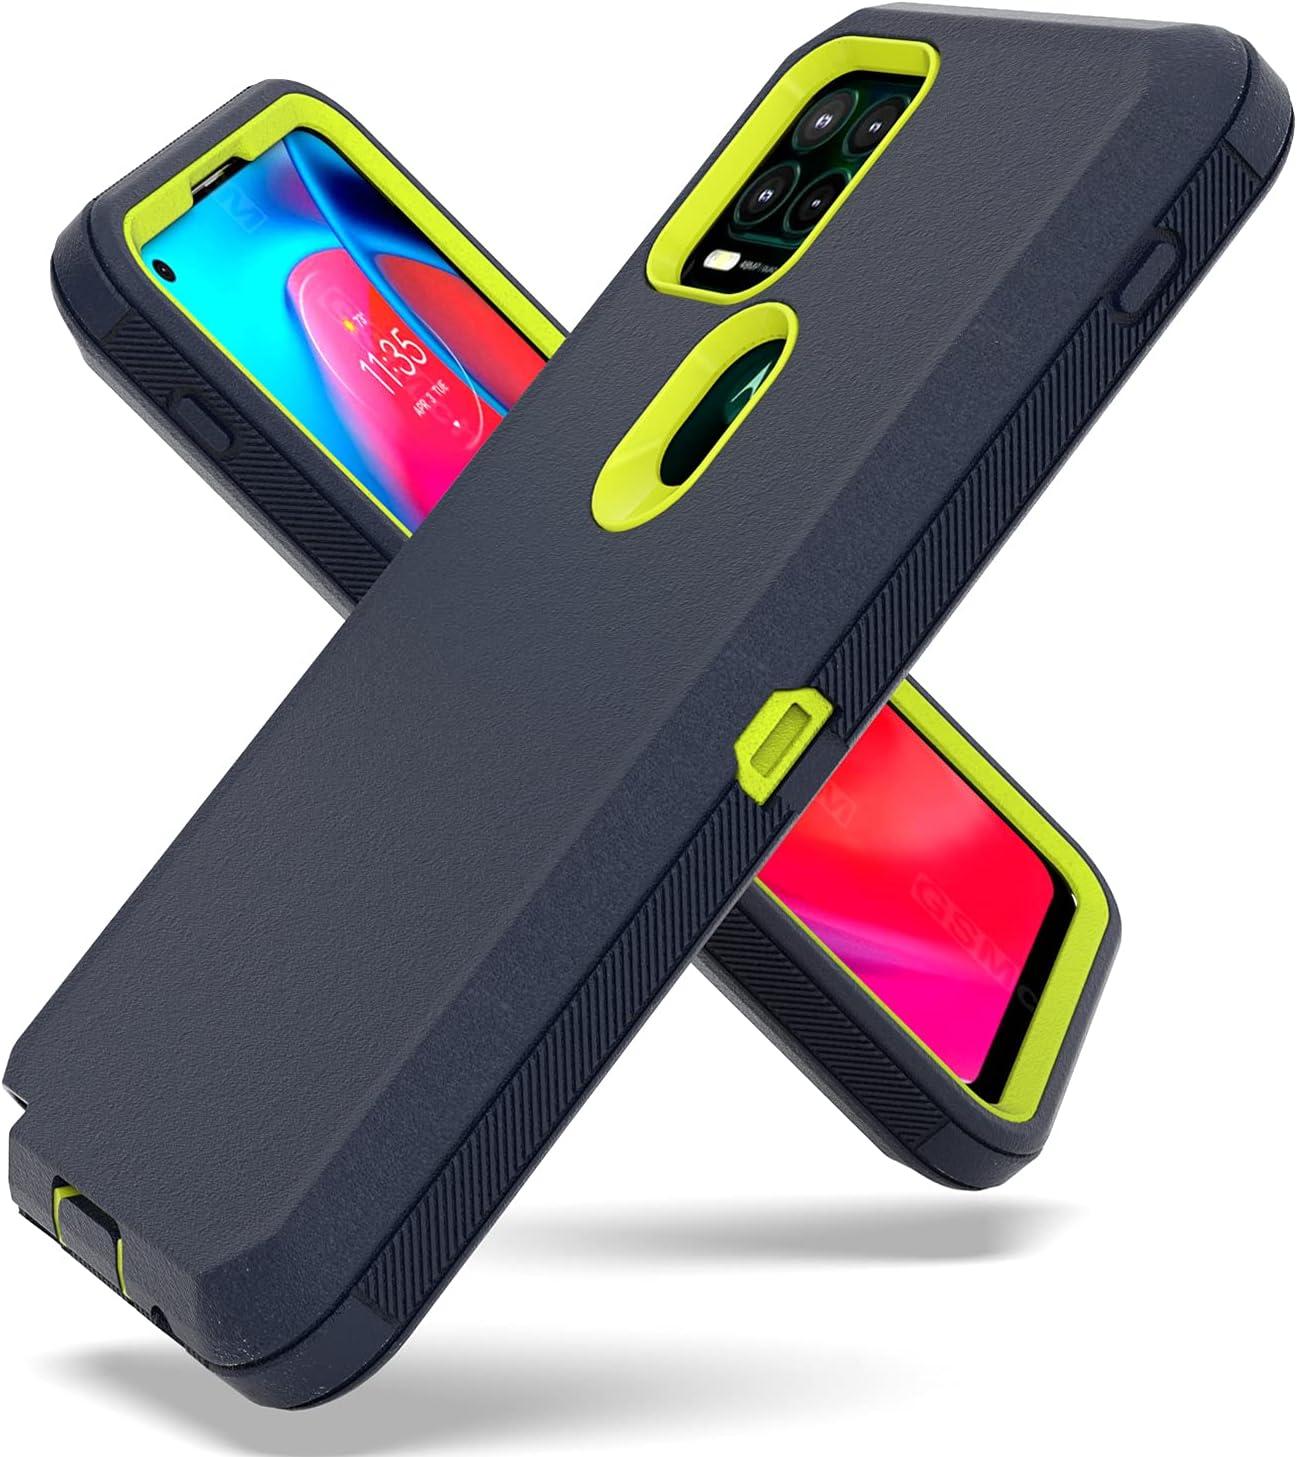 Fcclss Cell Phone Case for Motorola Moto G Stylus 5G 2021, Moto G Stylus 5G 2021 Case Heavy Duty Military Grade Hybrid 3 in 1 Shockproof Drop-Defender Case Cover, Dark Blue & Yellow